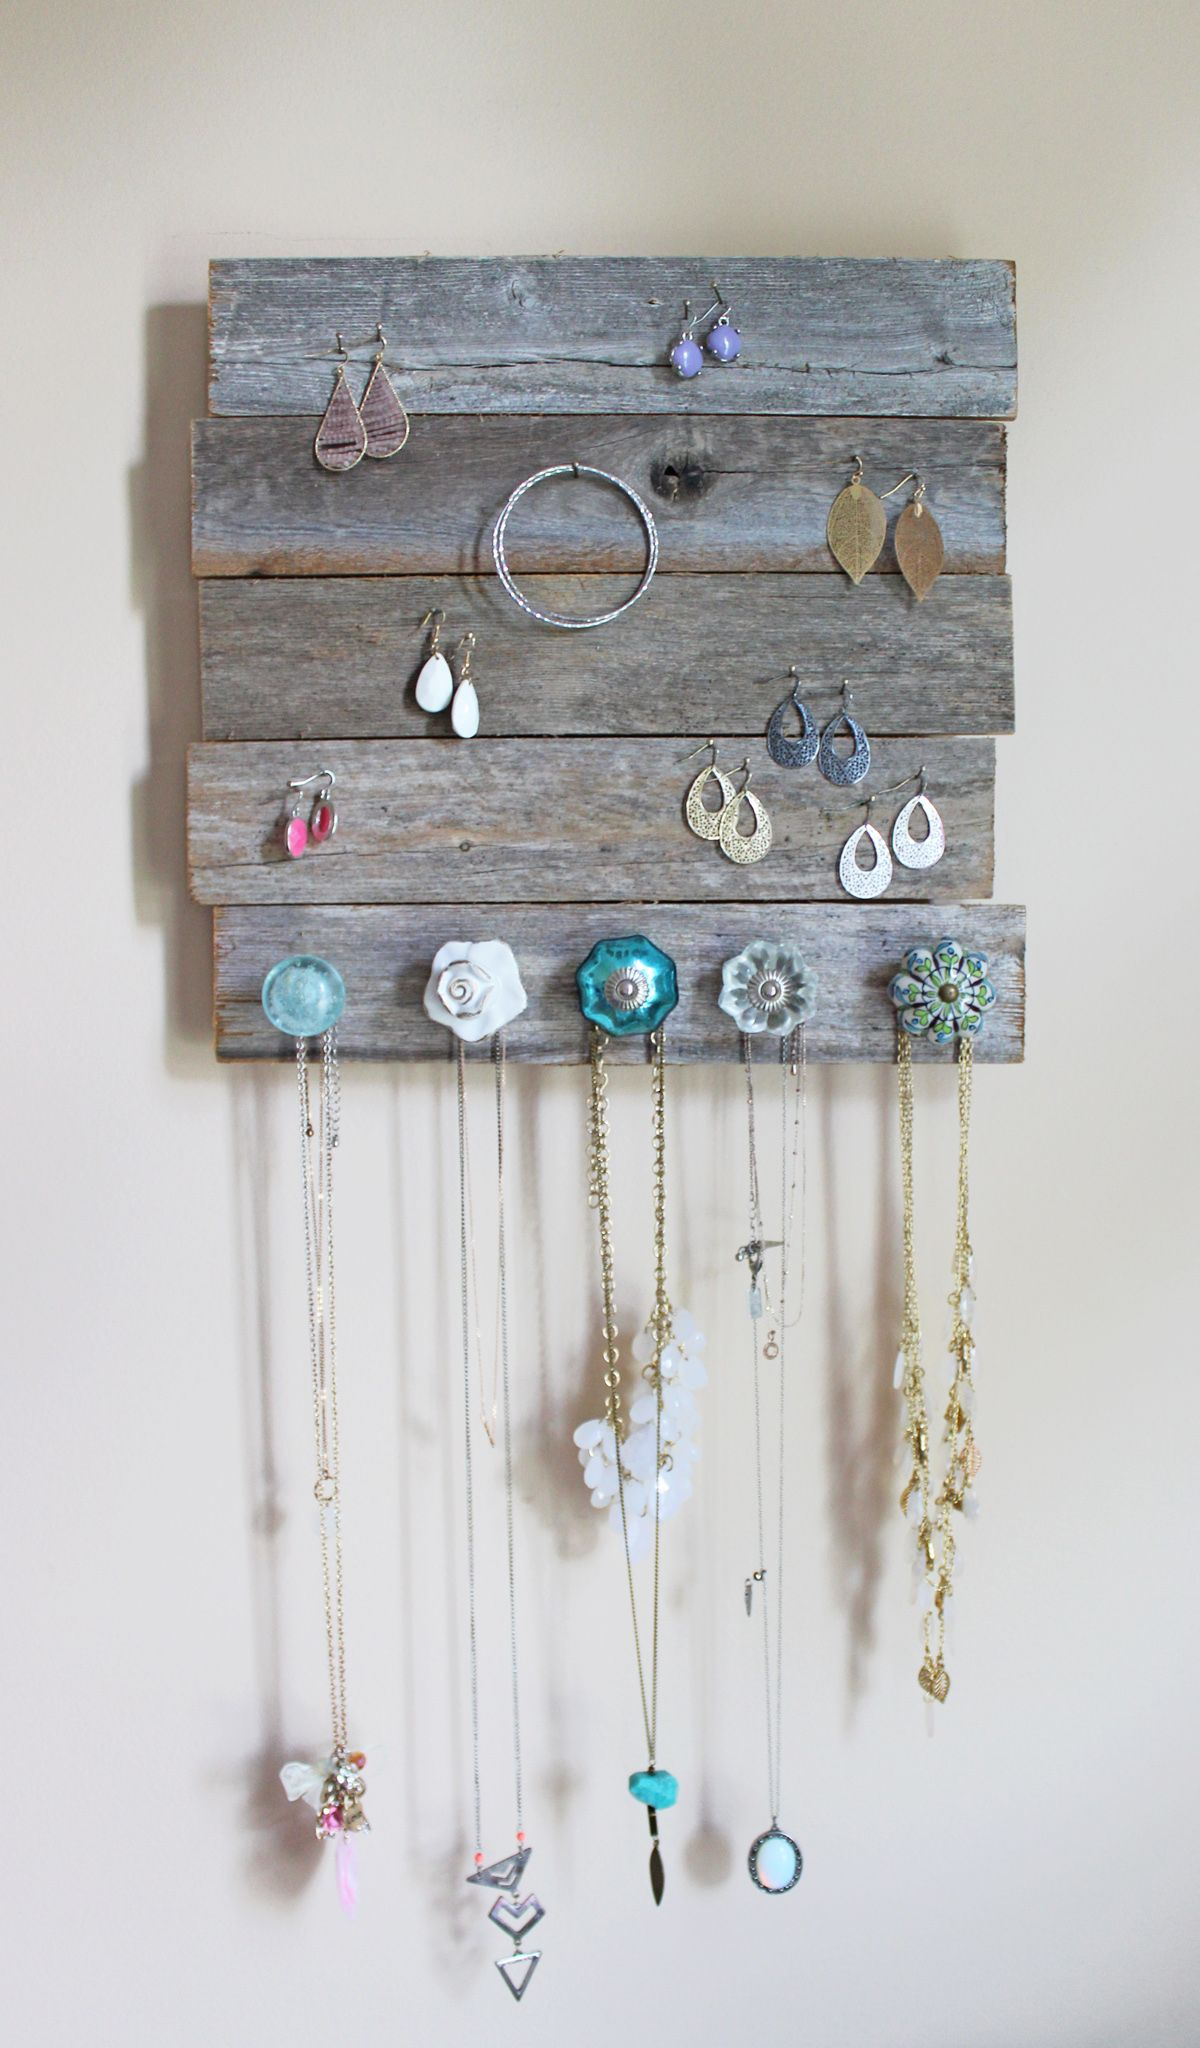 Diy Jewelry Holder The Balanced Guru Diy Jewelry Holder Jewelry Organizer Wall Diy Holder